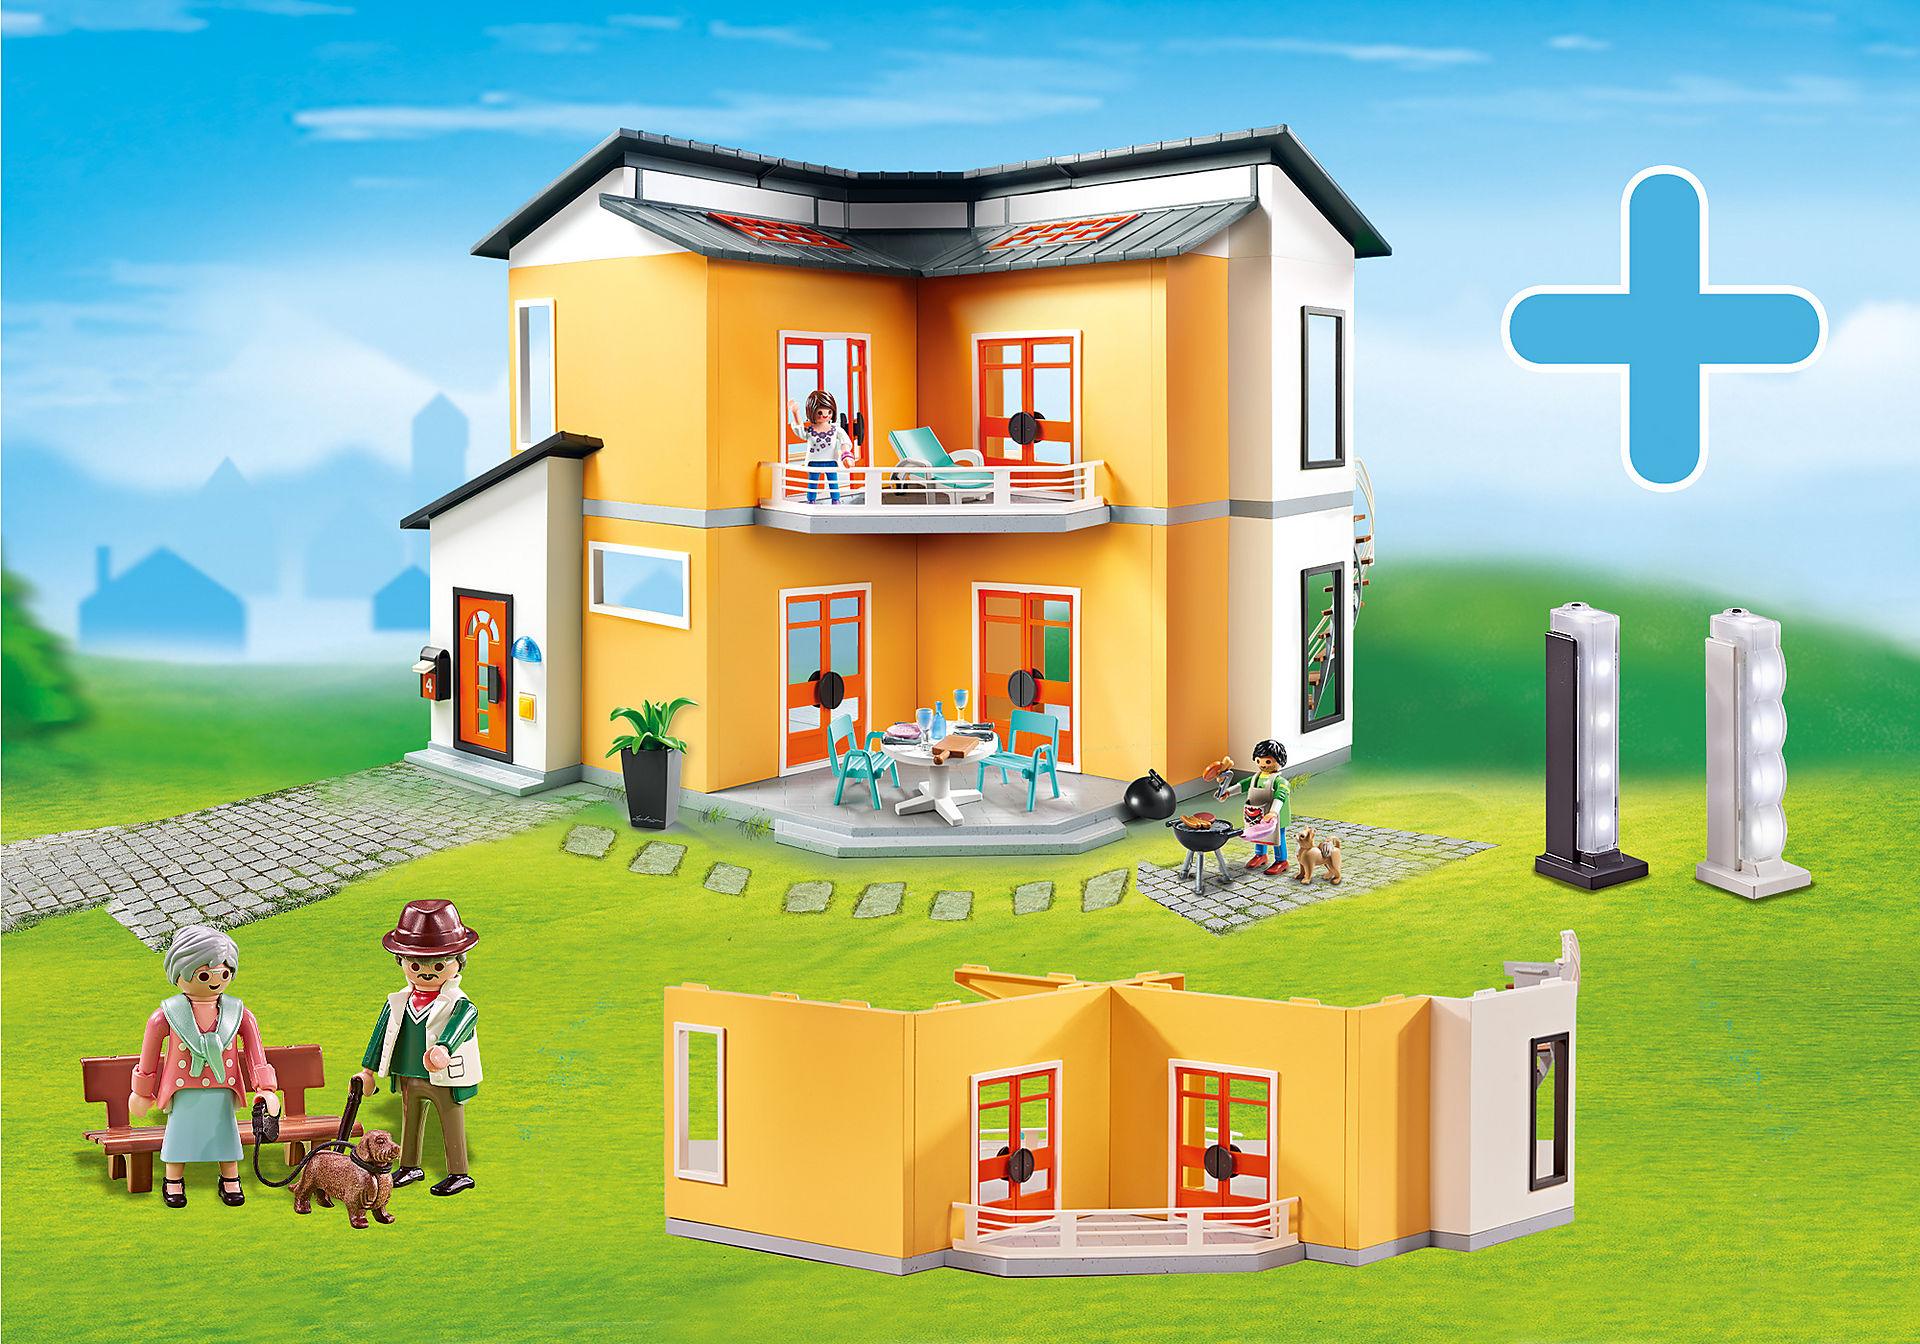 PM2014M Bundel Moderne Villa III zoom image1